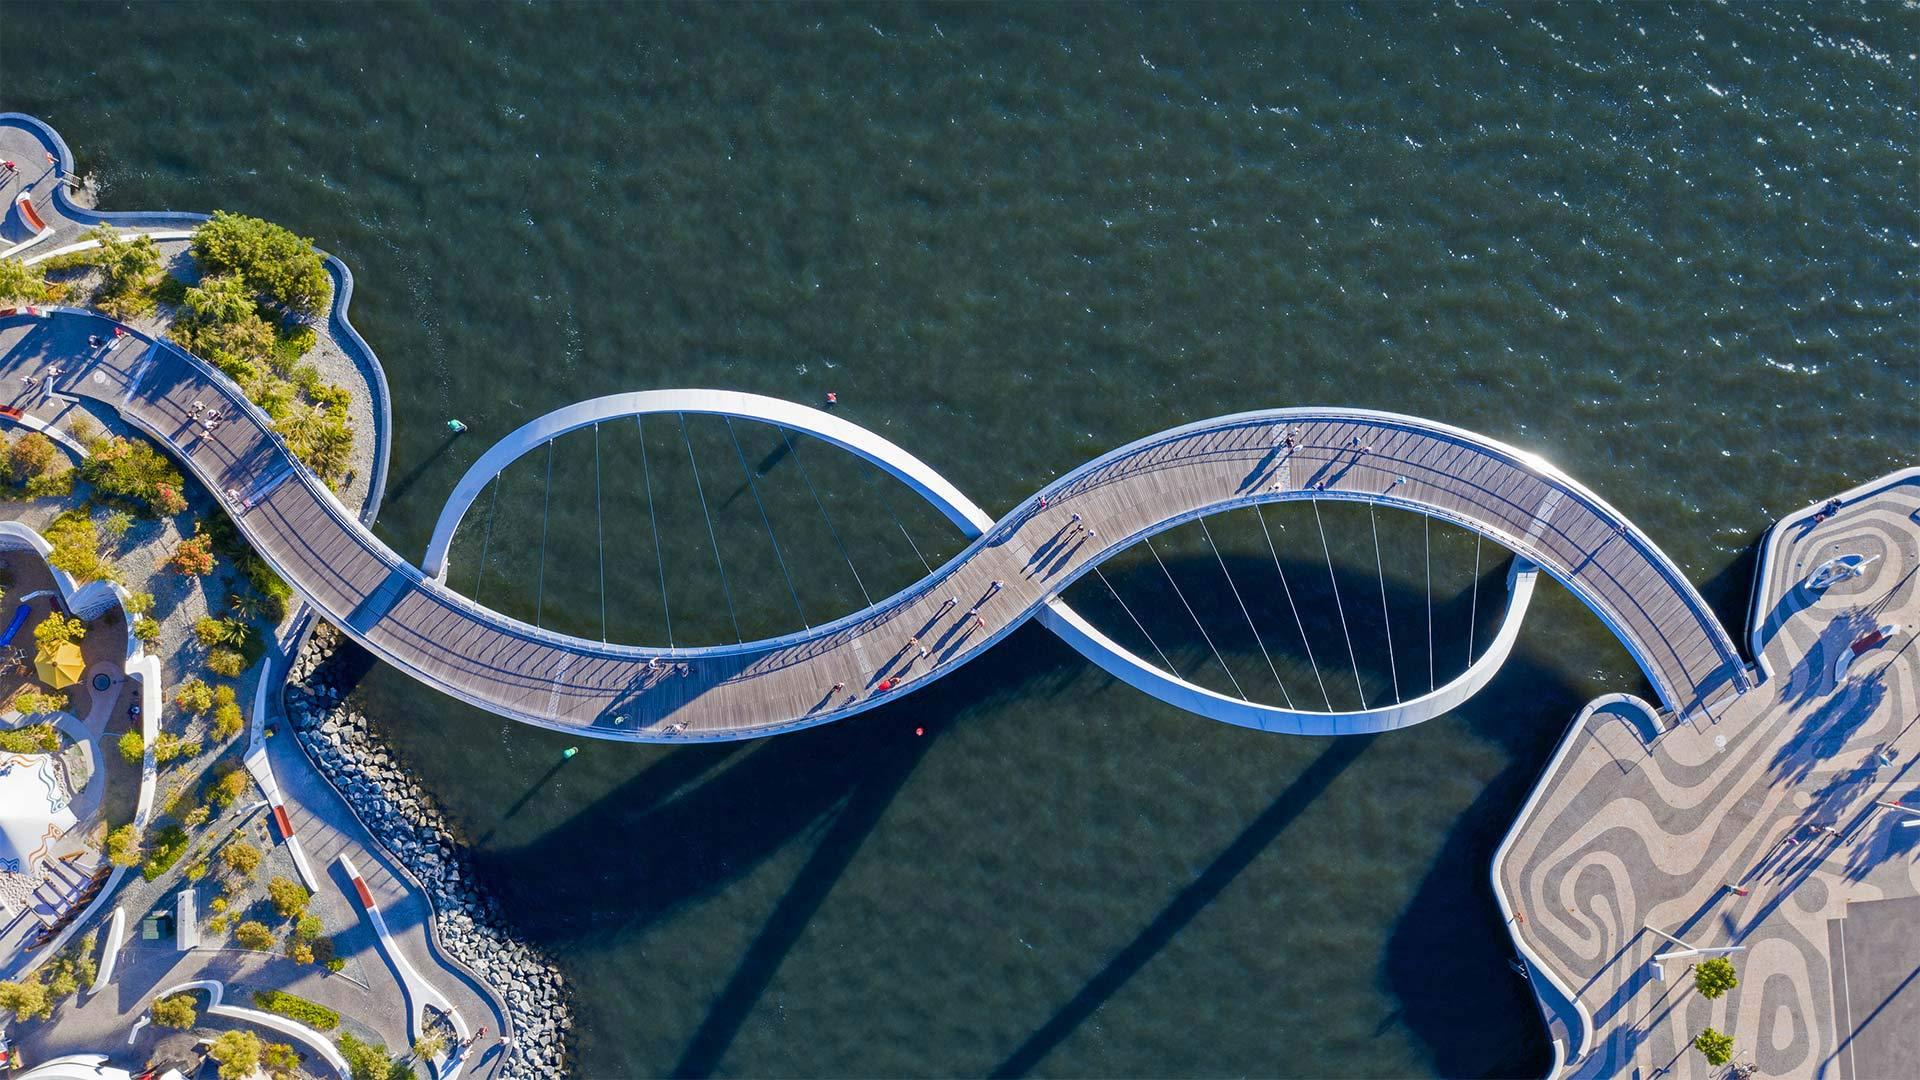 Elizabeth Quay Bridge, Perth, Australia (? Amazing Aerial Agency/Offset by Shutterstock)